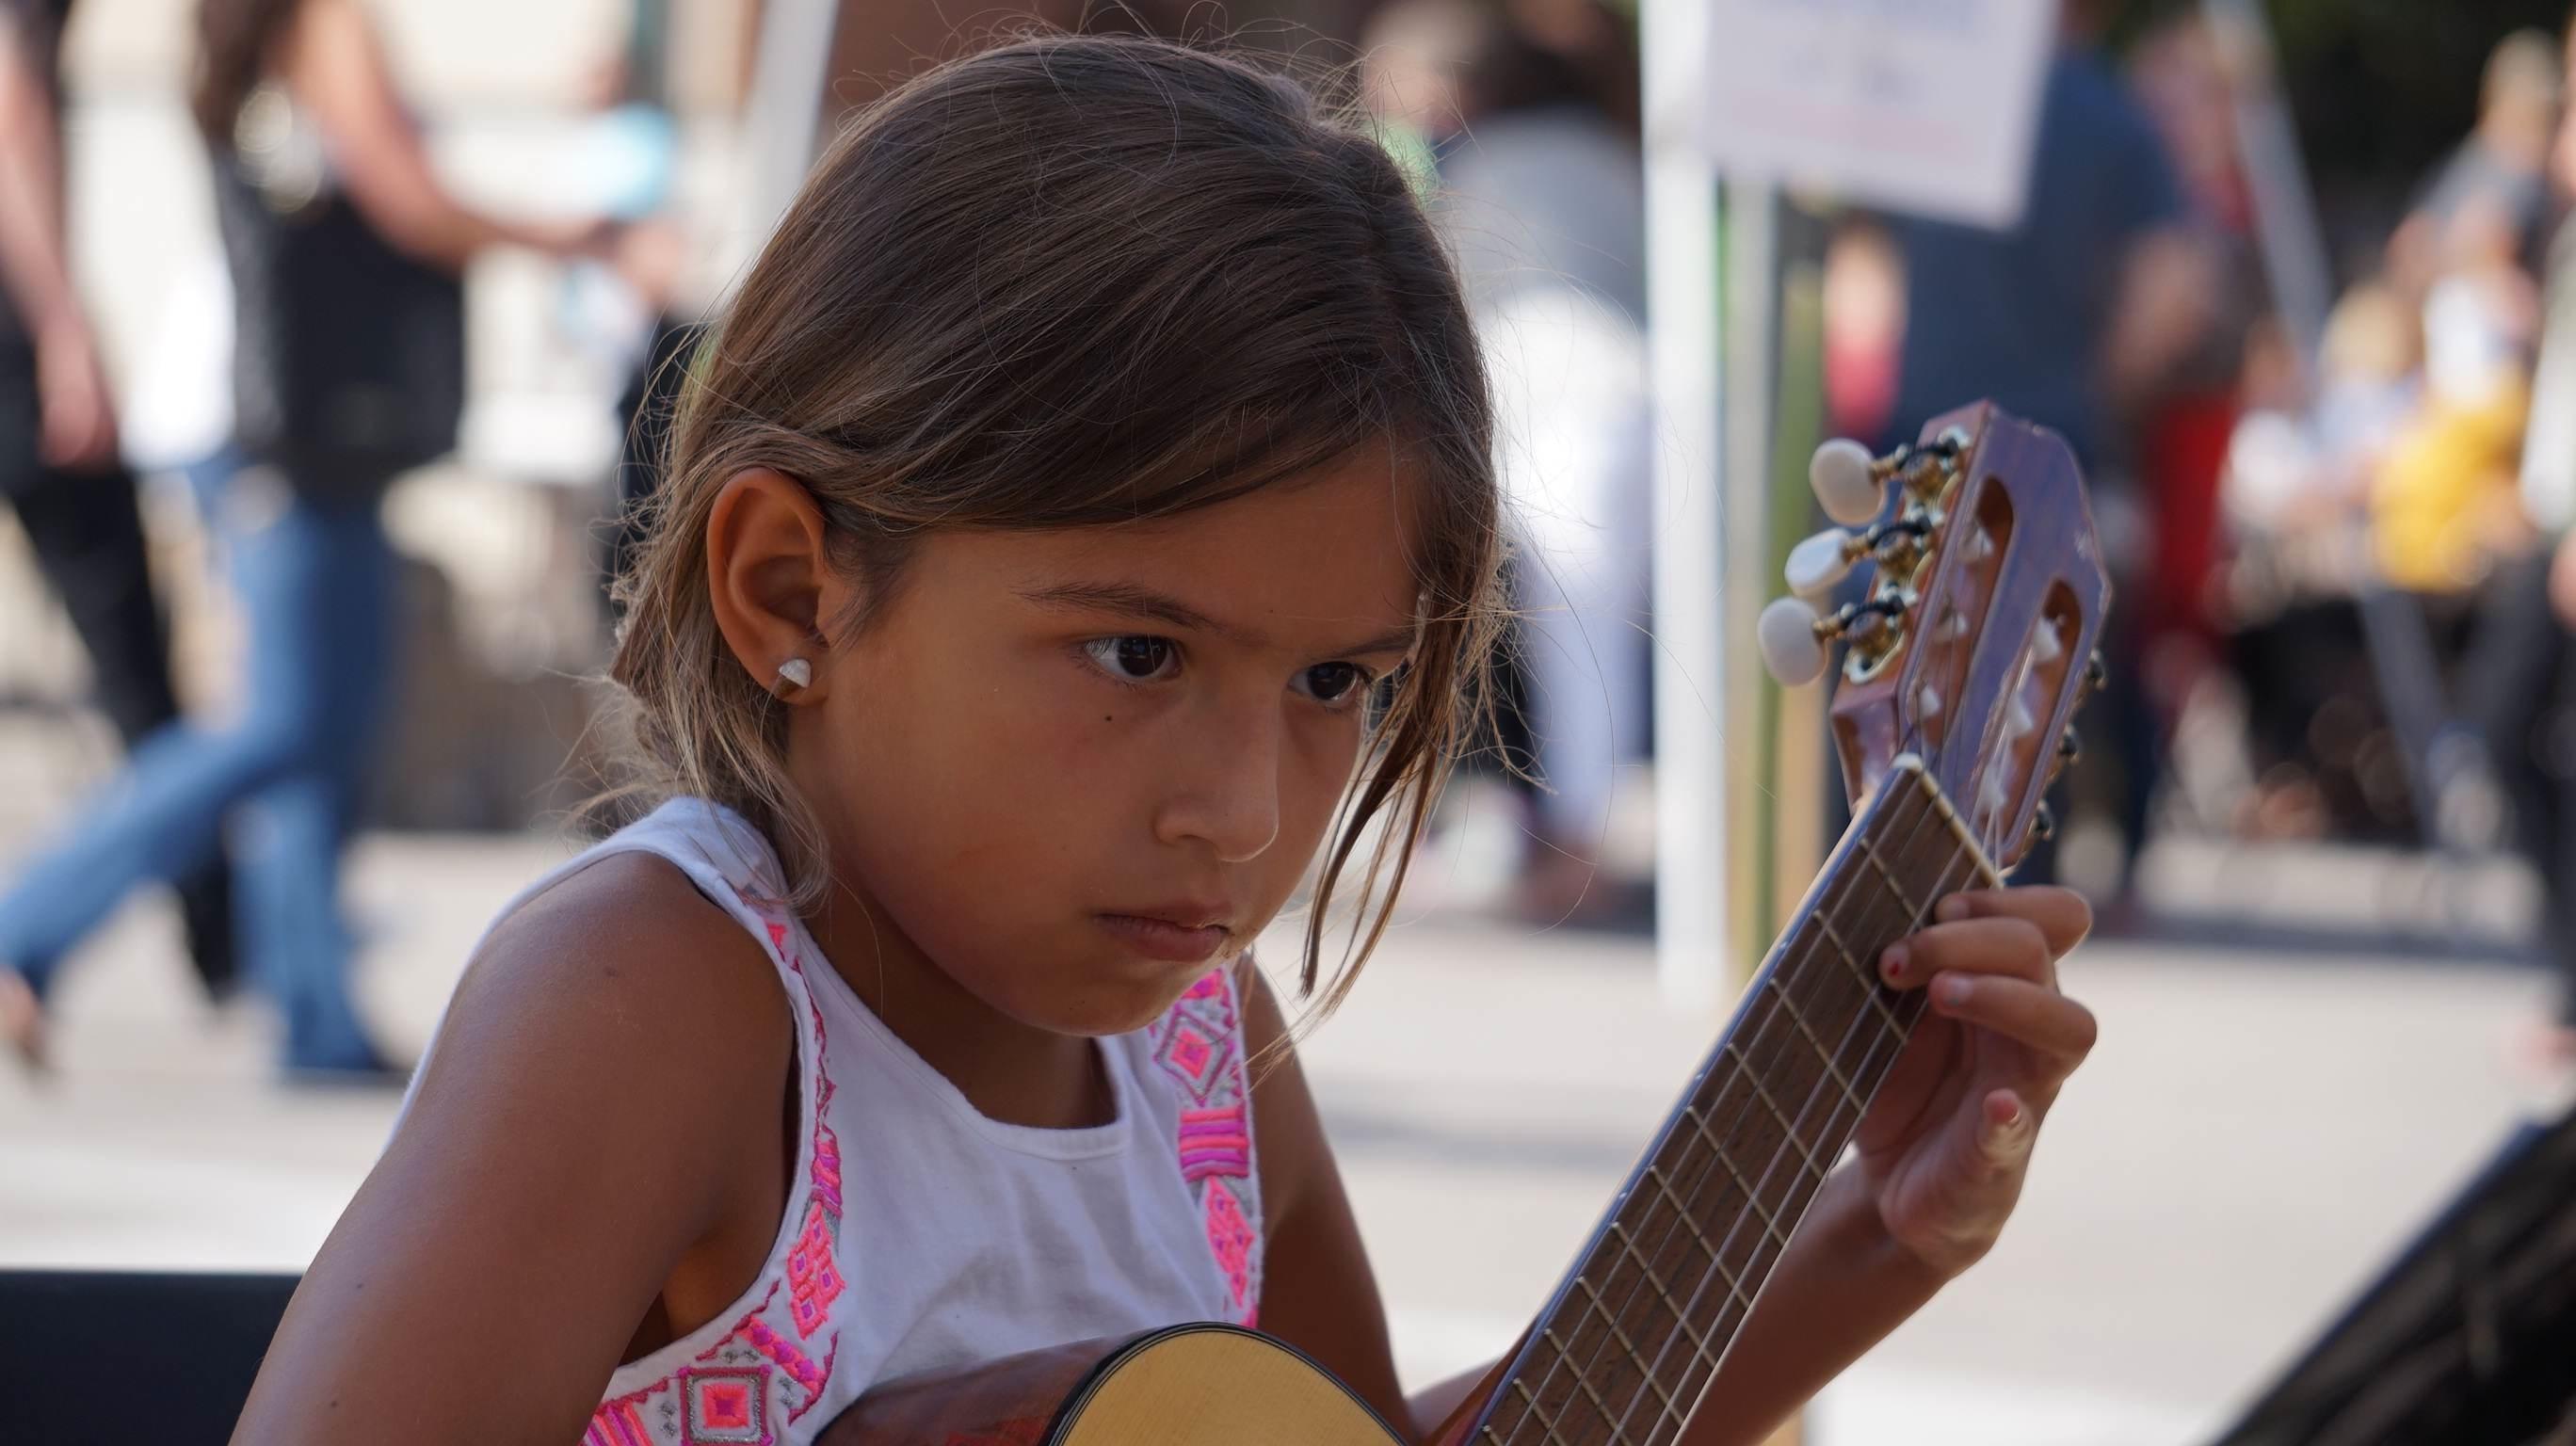 Girl-at-festival-Stl.